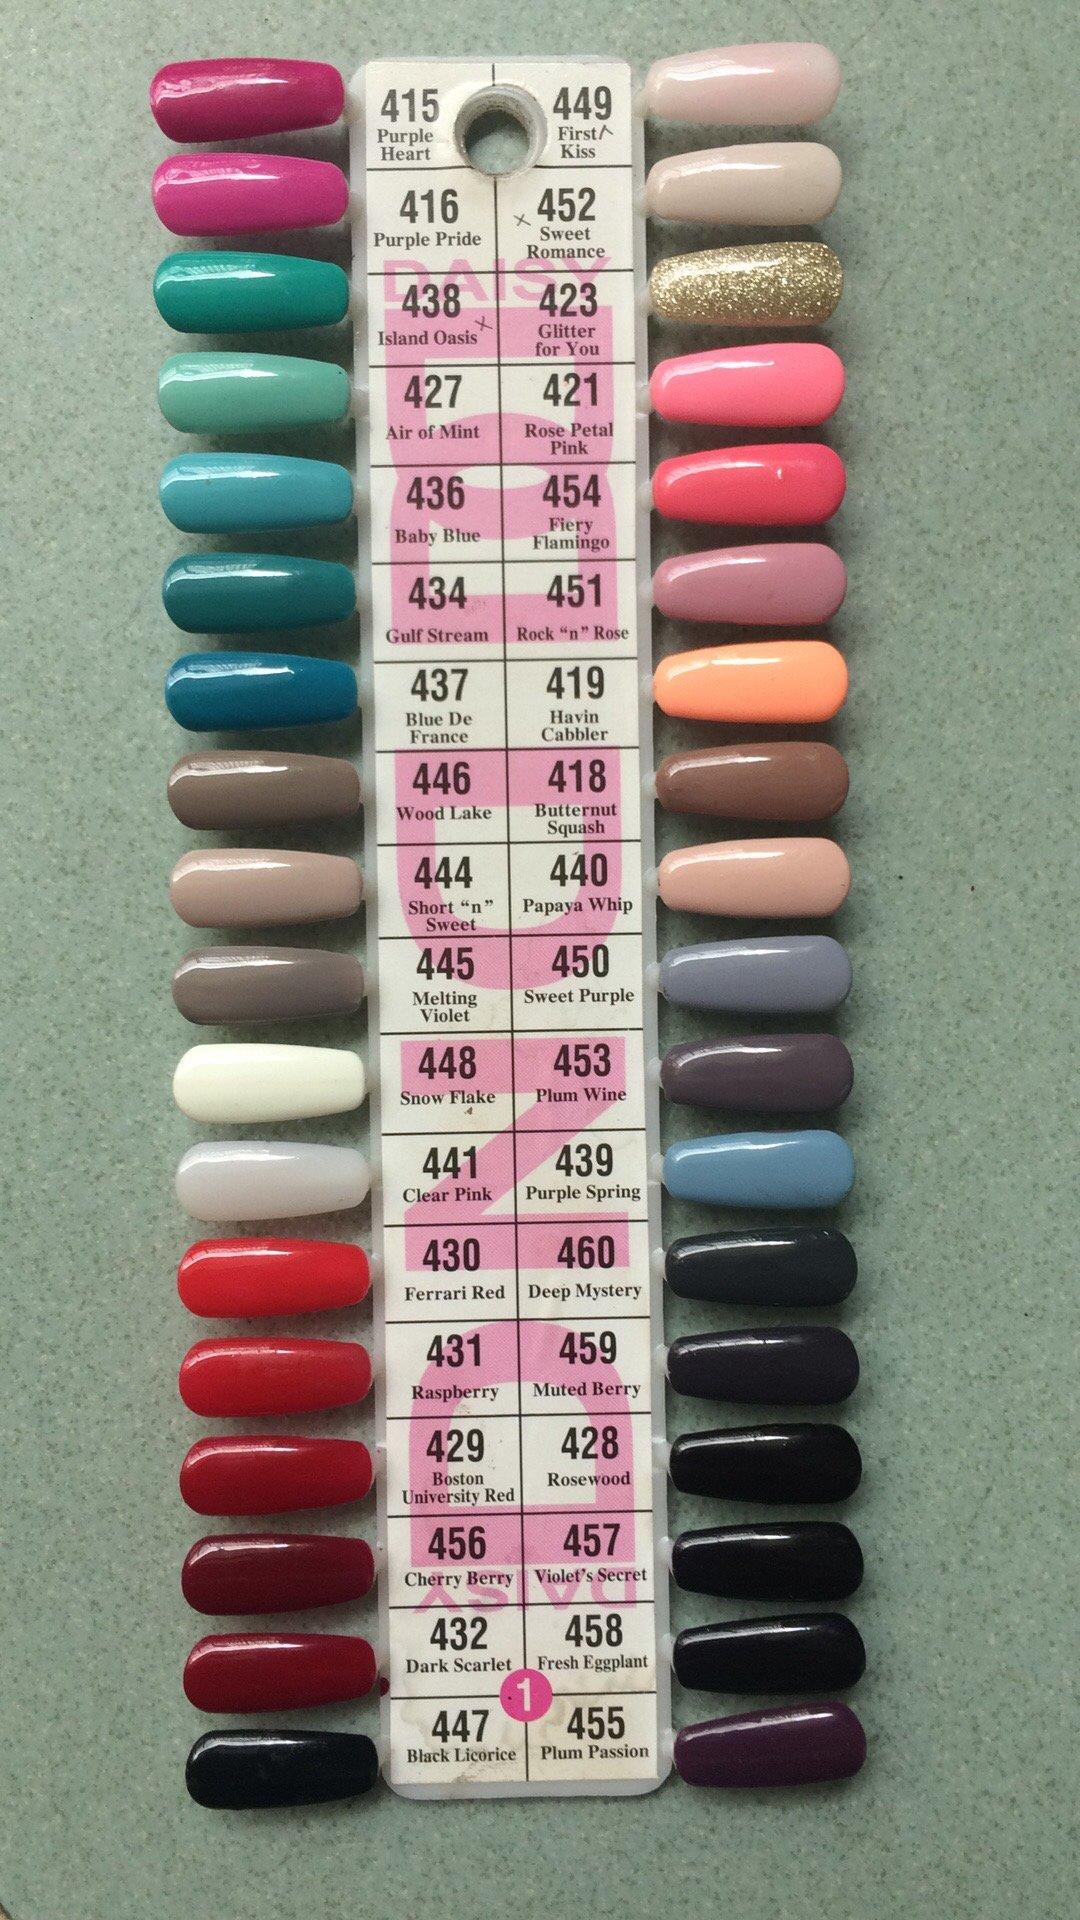 Dnd Daisy Gel Polish Color Sample Chart Palette Display New No 1 Gel Polish Colors Dnd Gel Polish Nail Colors Winter